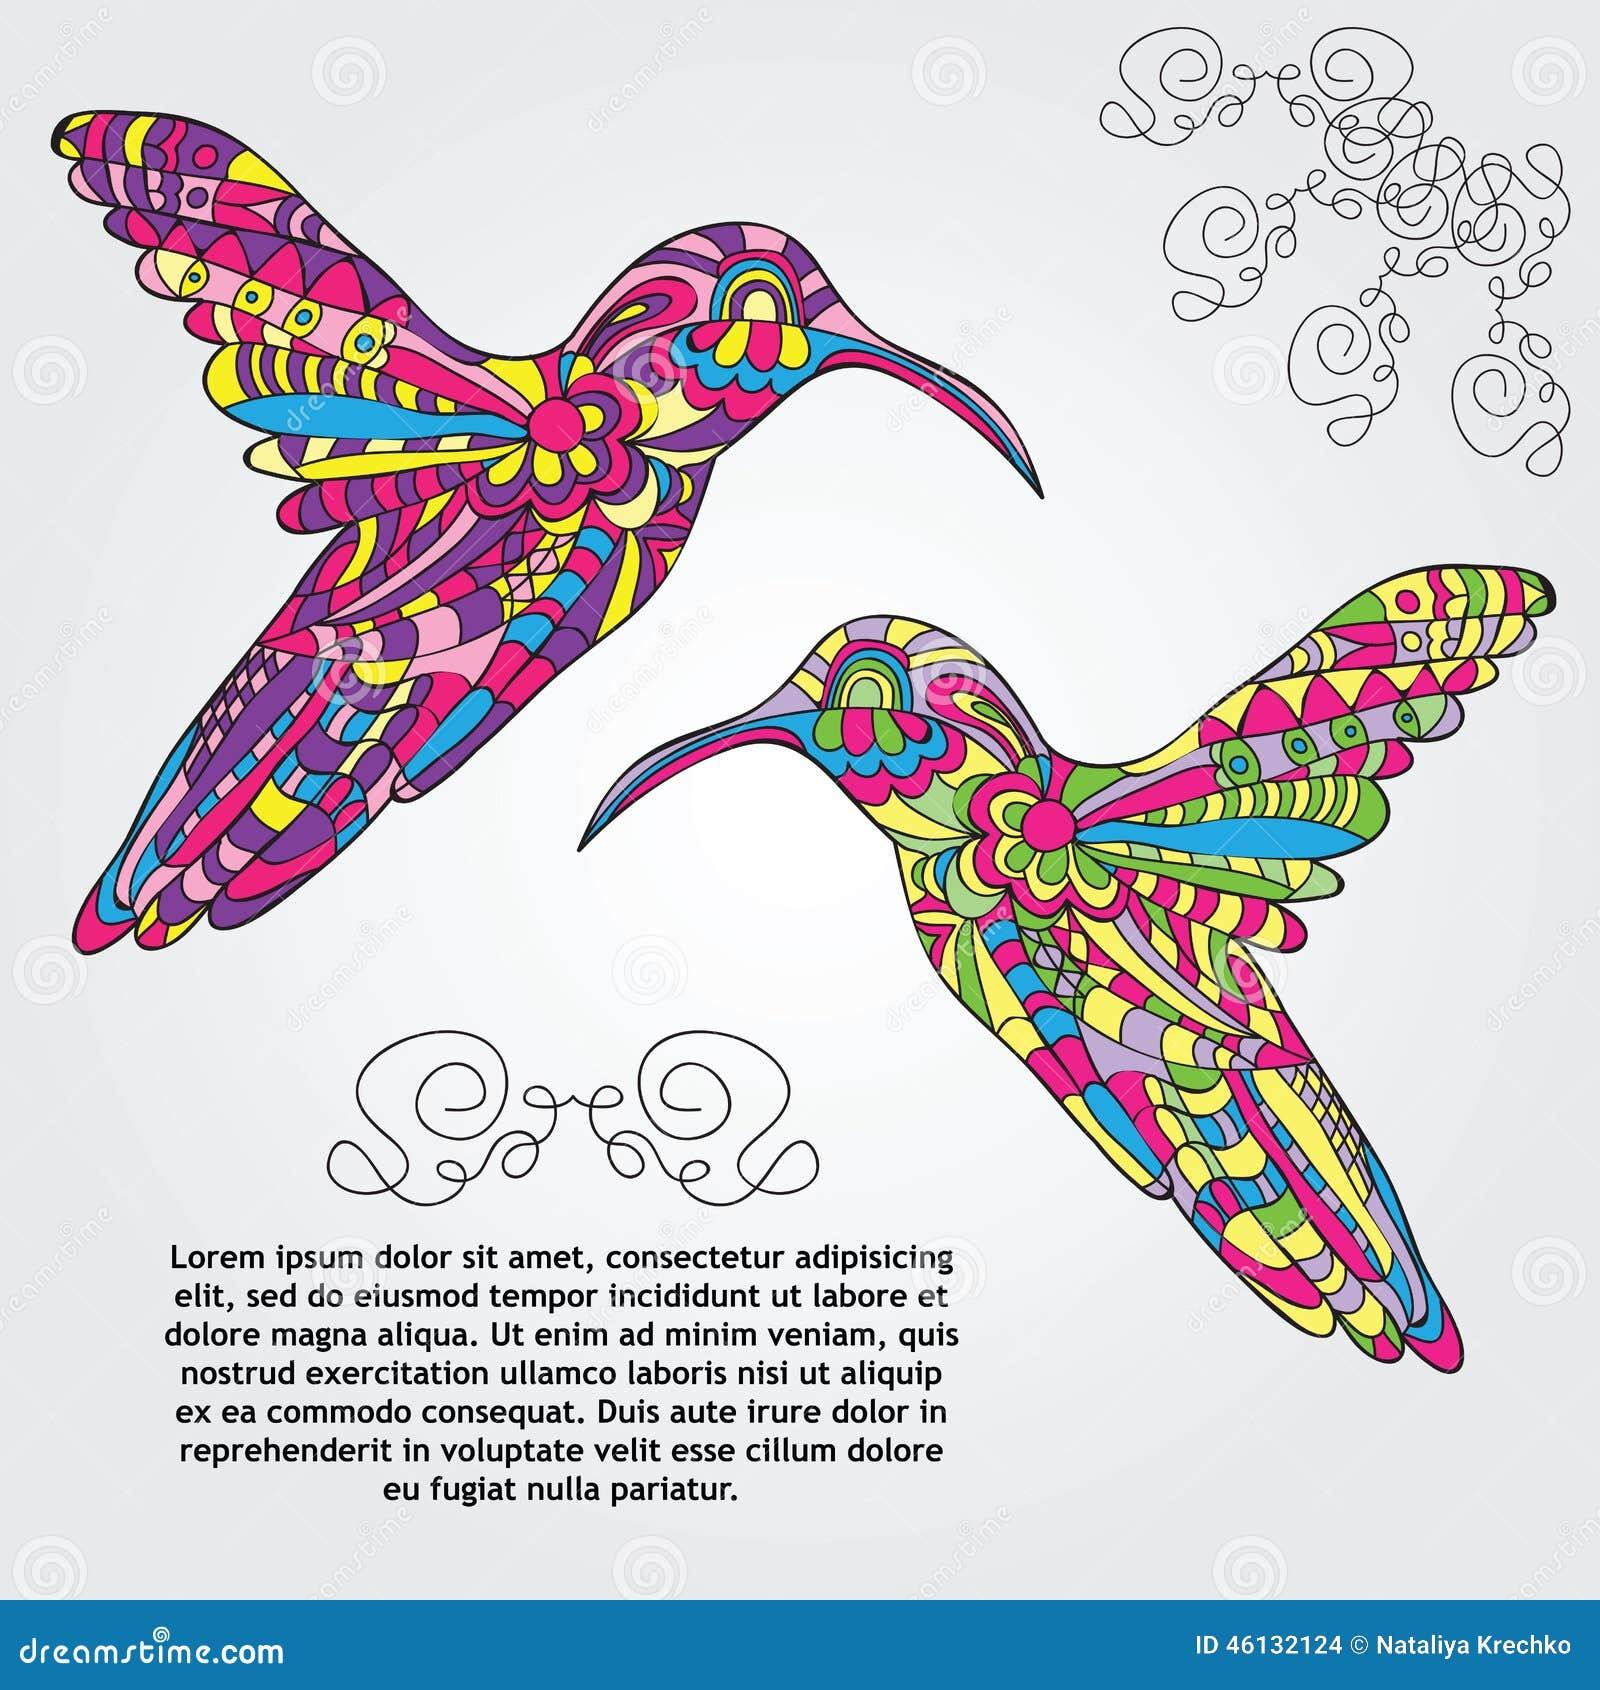 Habitat on web habitat technology group - Vector Hummingbird Stock Vector Image 46132124